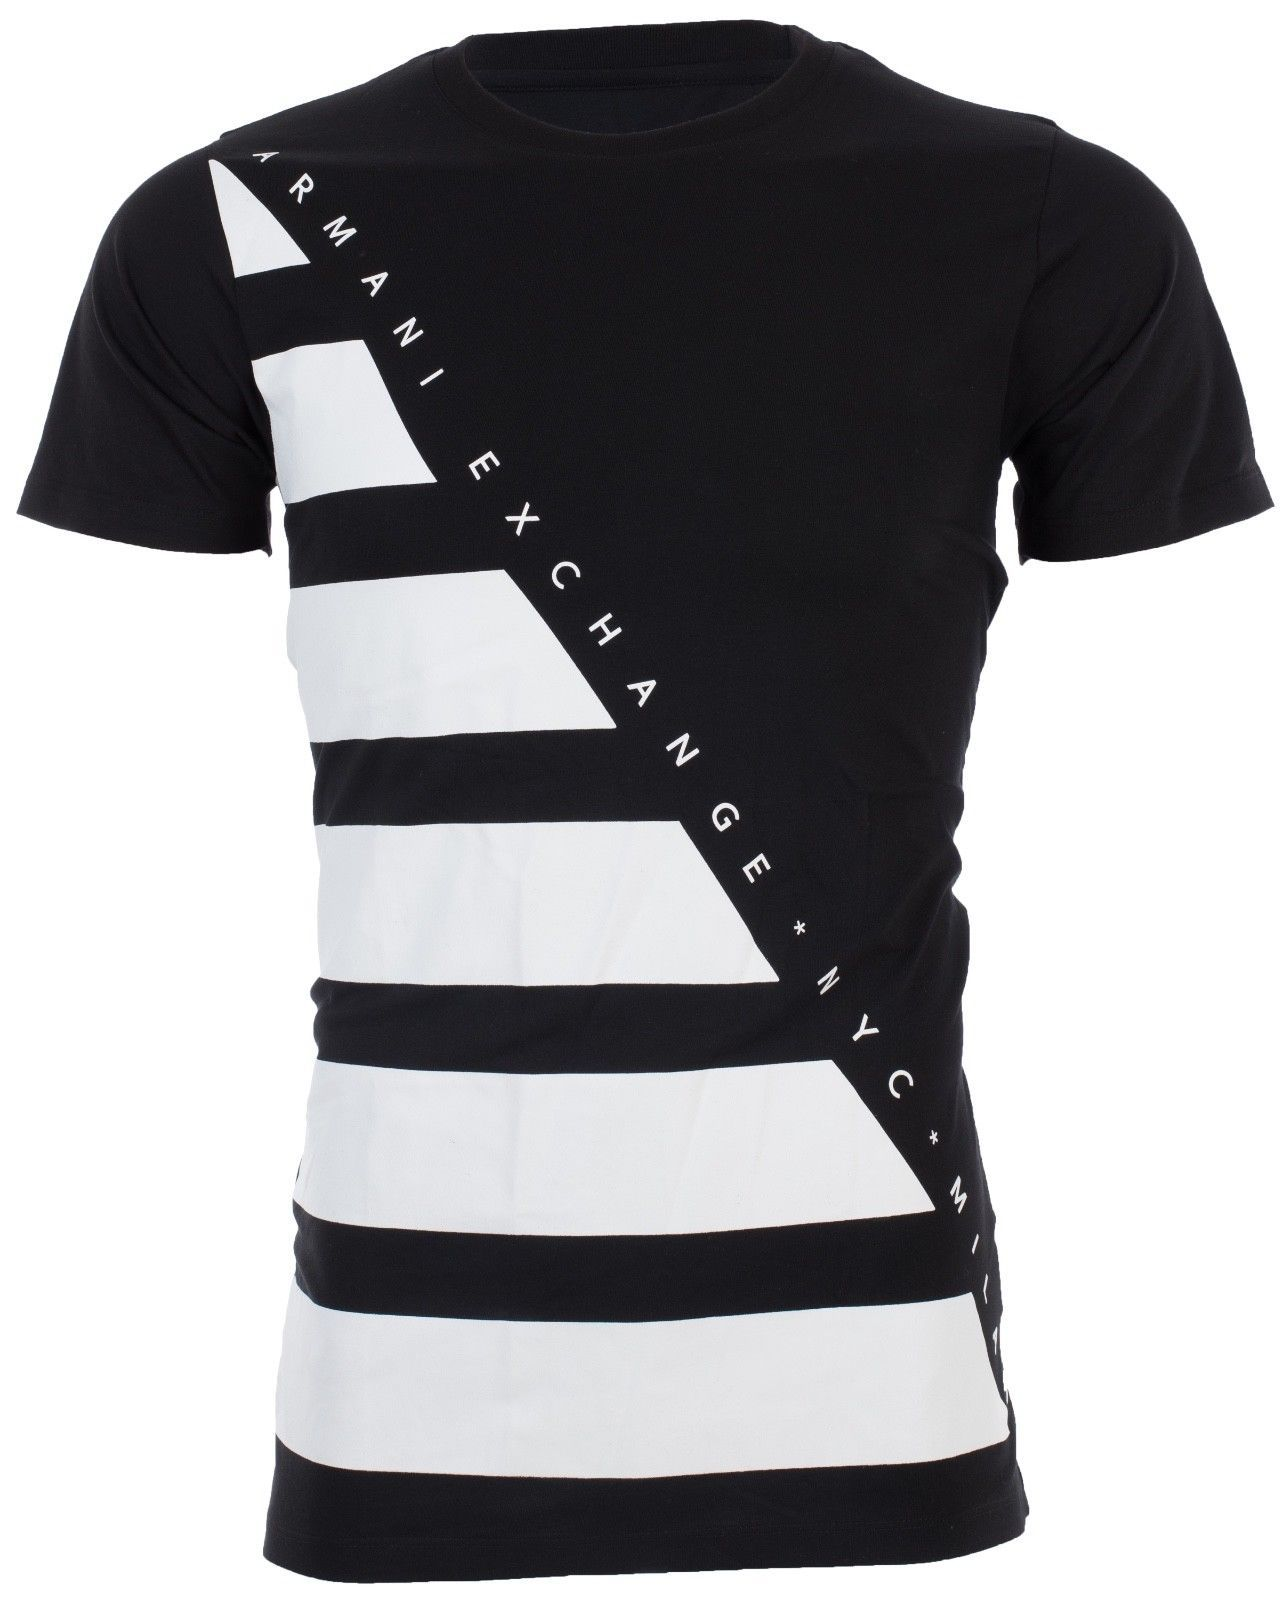 156c768a9e570 Armani Exchange Men T-Shirt Diagonal Stripe Premium Black White Designer  $45 Nwt